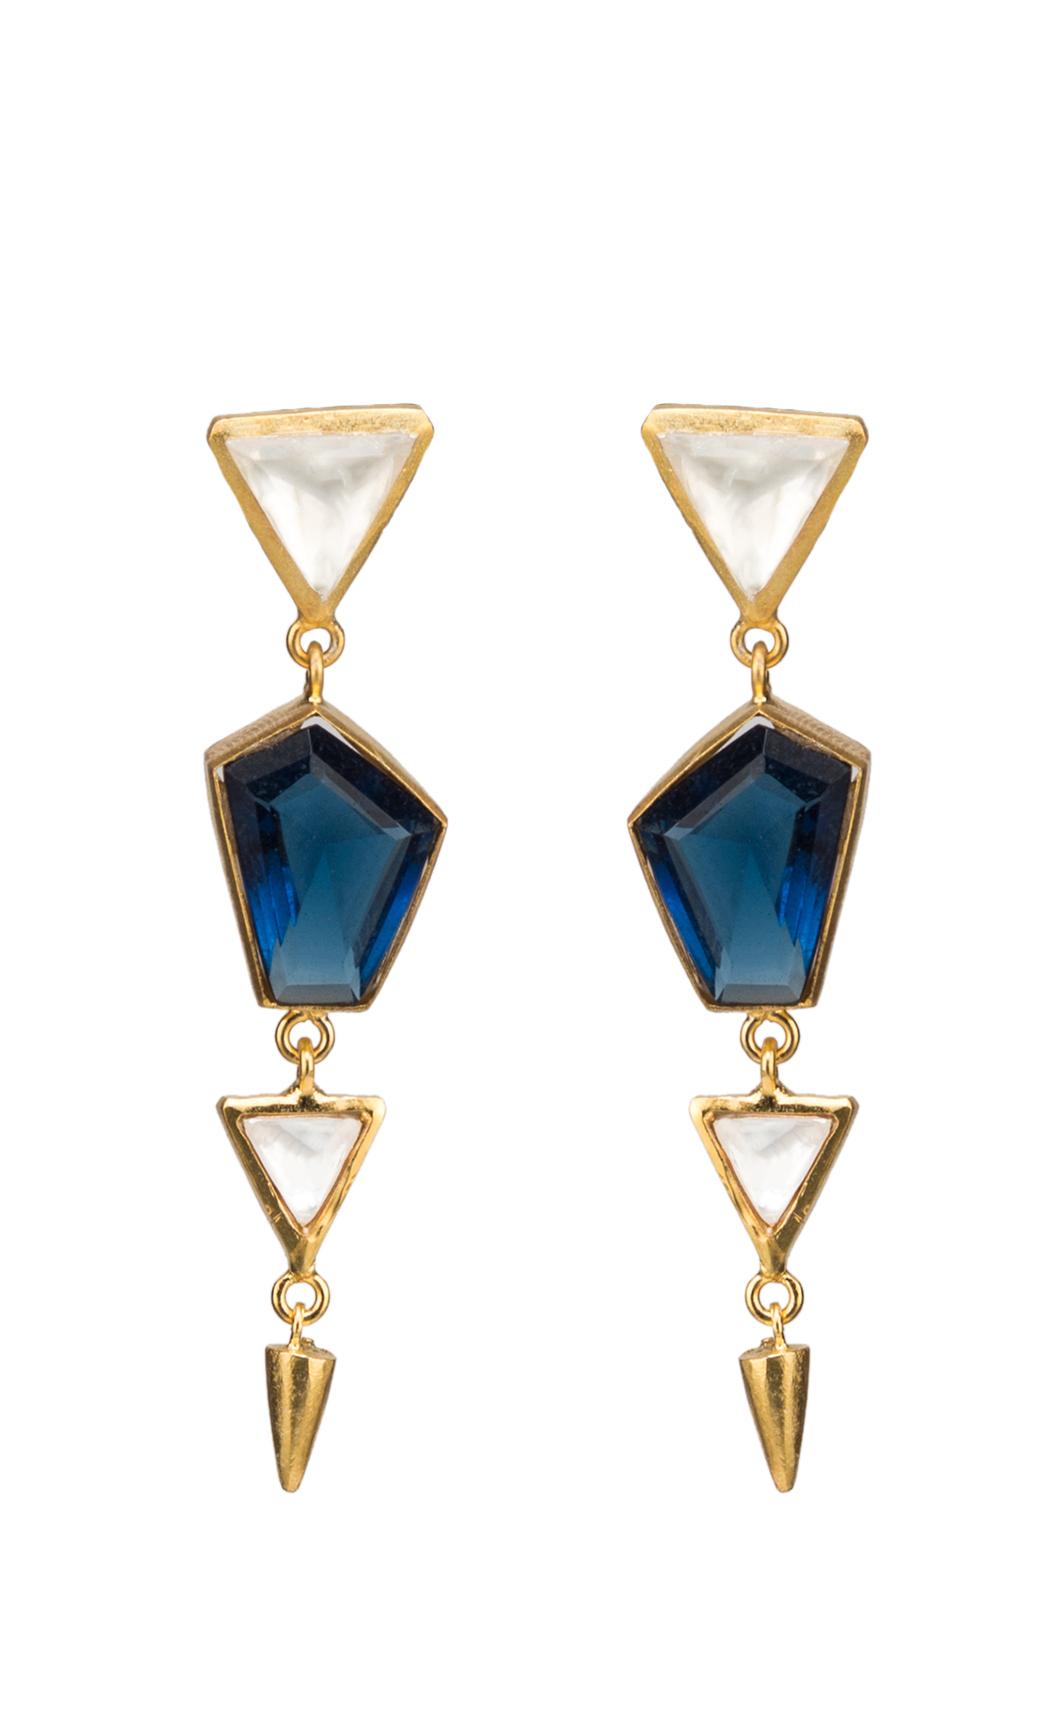 Colored Stone and Triangular Kundan Earrings